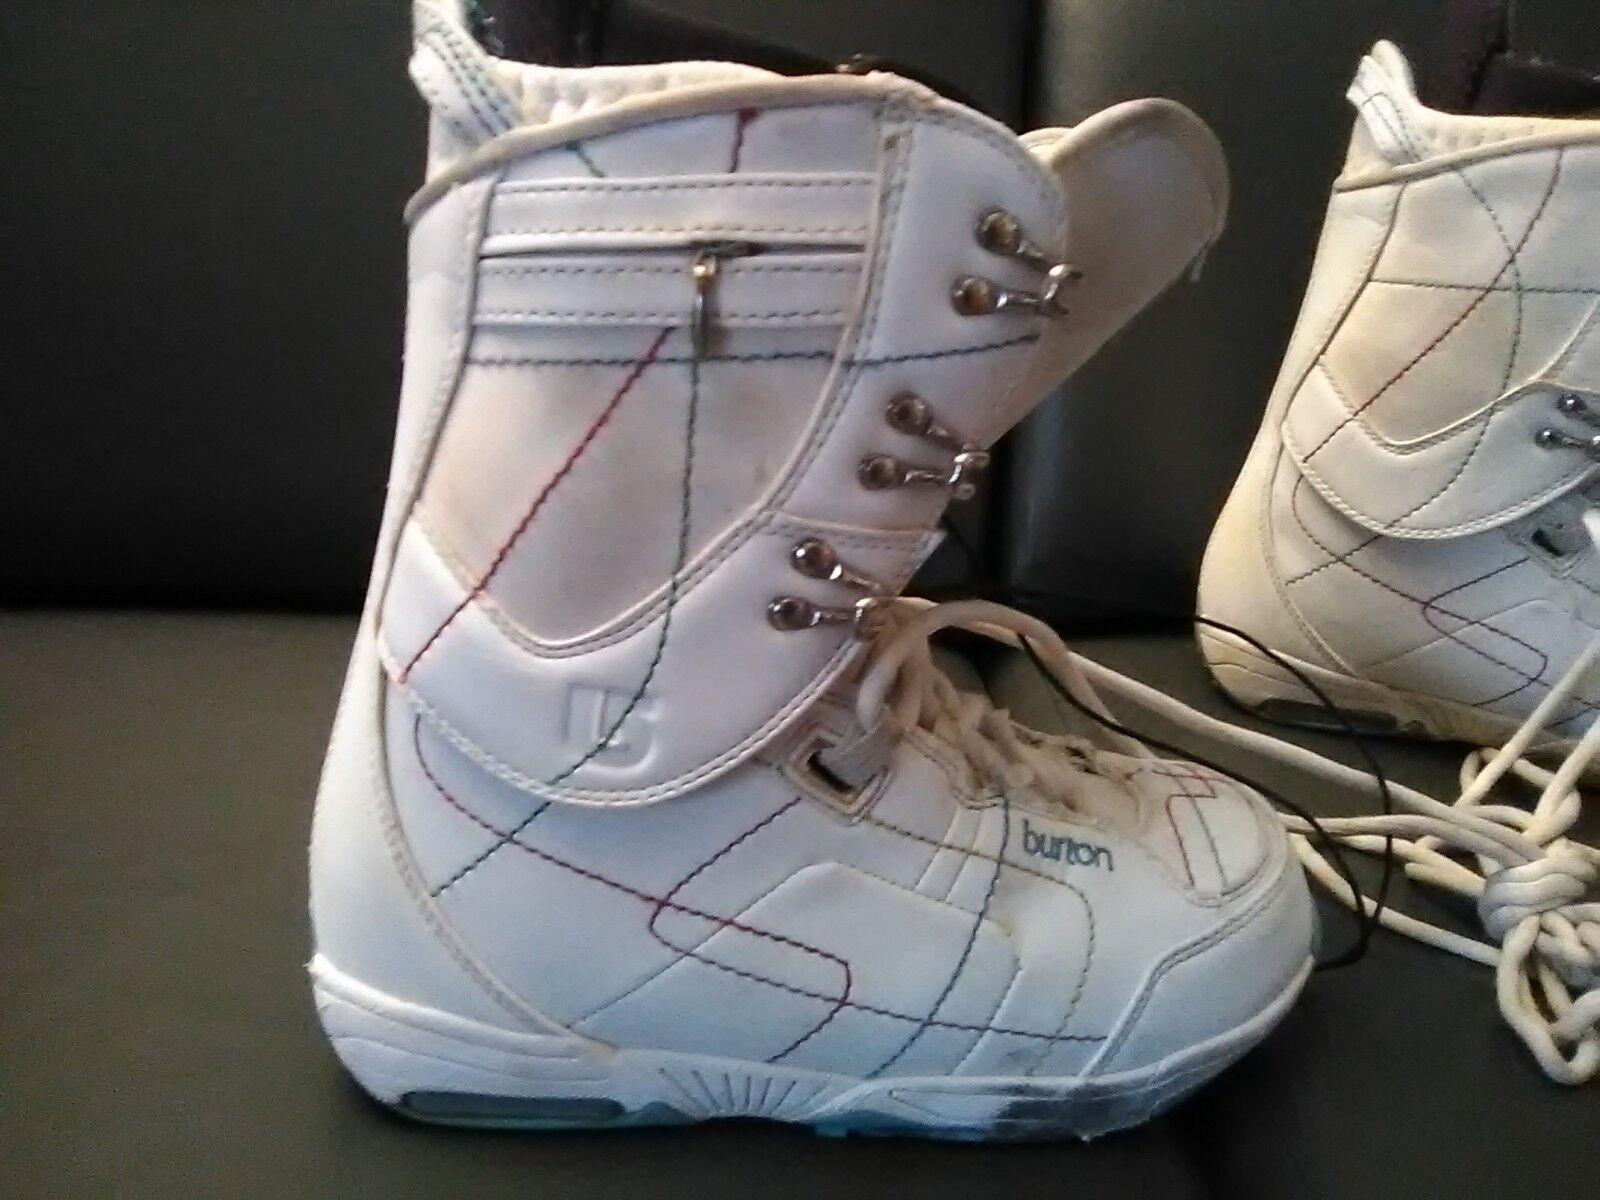 BURTON WOMEN'S SAPPHIRE SNOWBOARD SKI BOOTS WHITE US SIZE 7.5 Nice